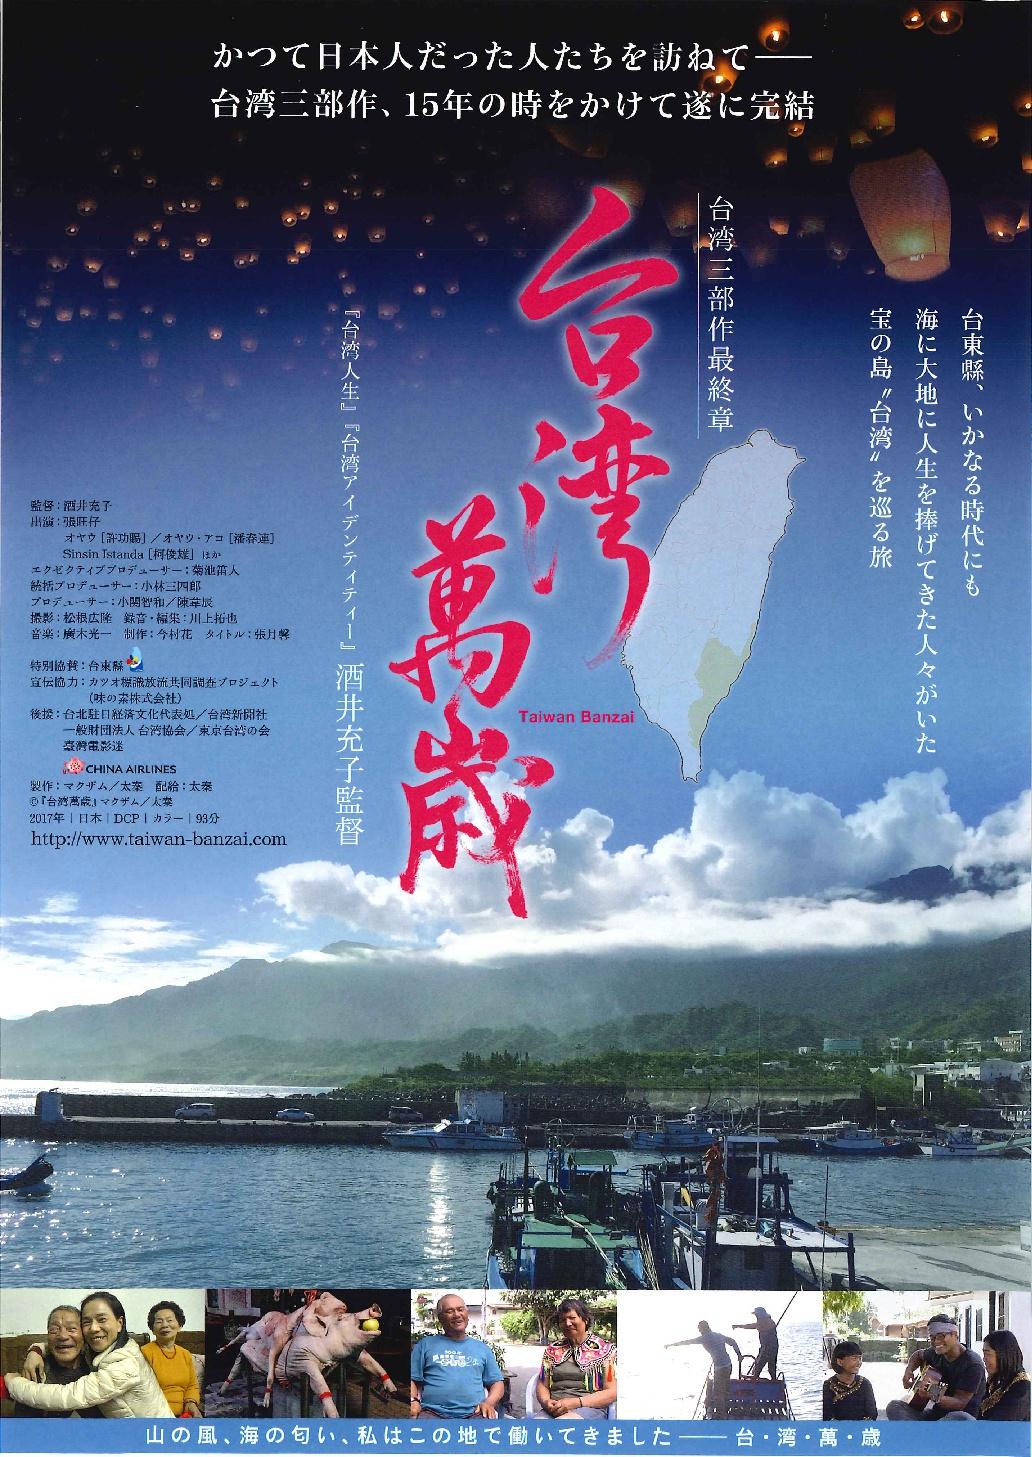 taiwanbanzai_chirashi-001.jpg